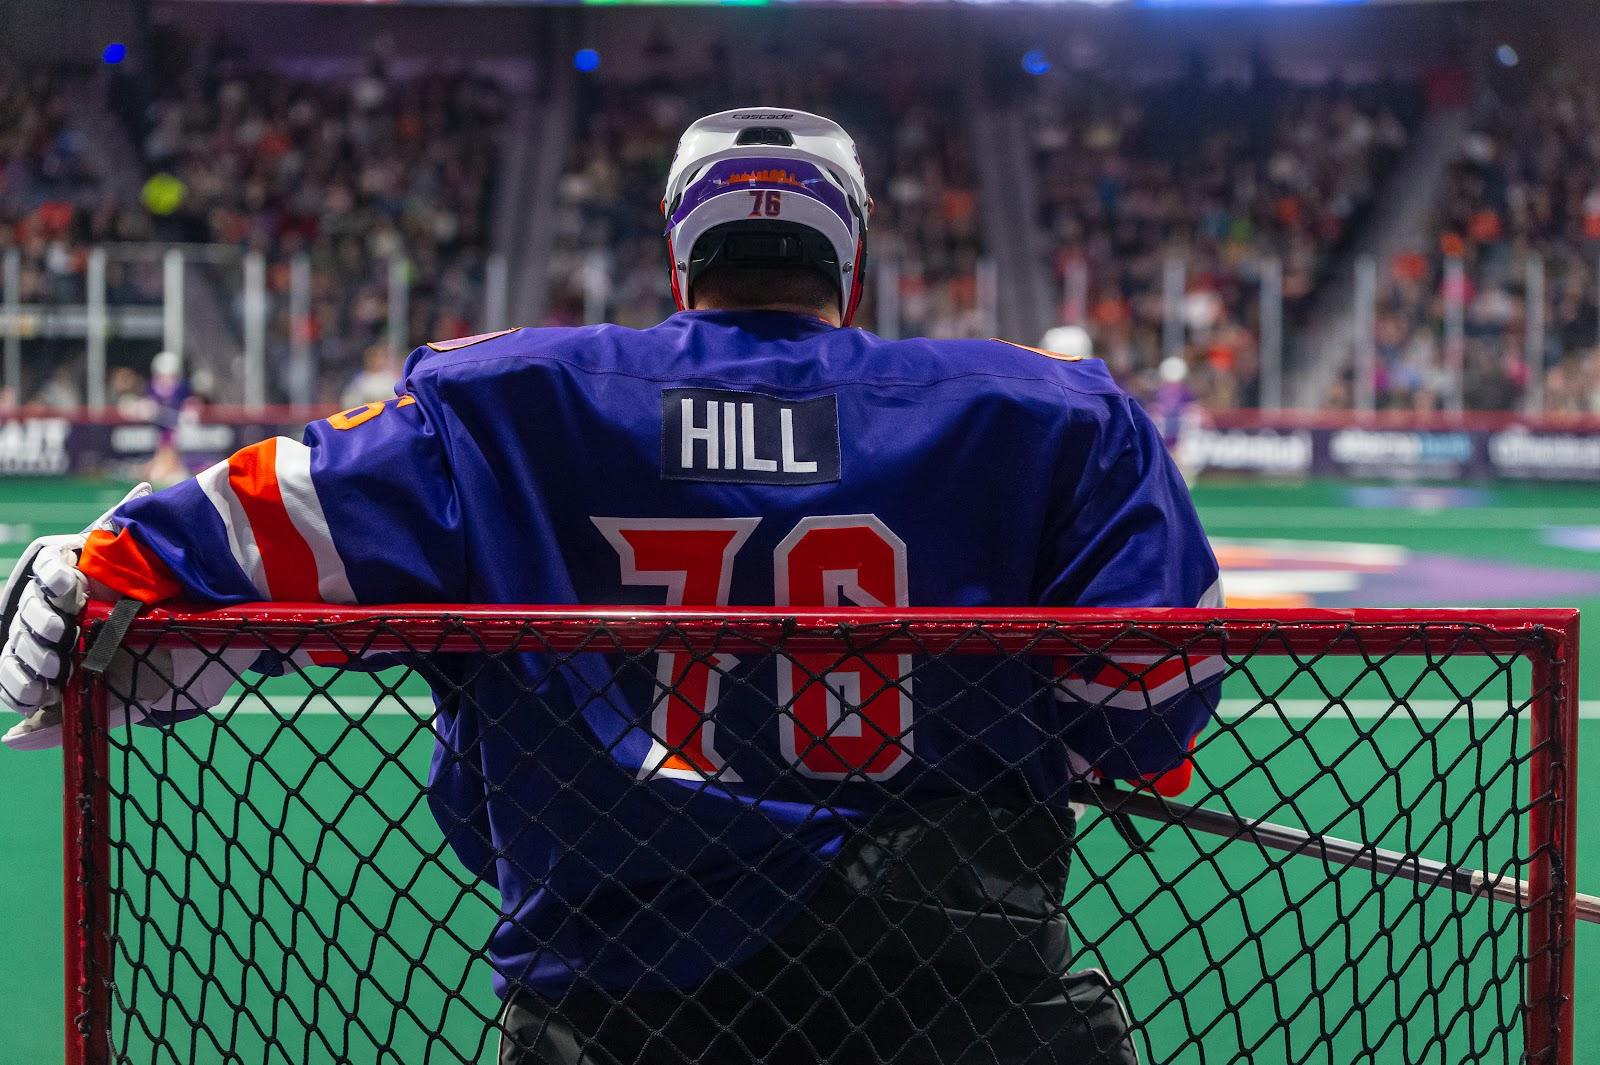 Pro lacrosse goalie From behind looking down the floor